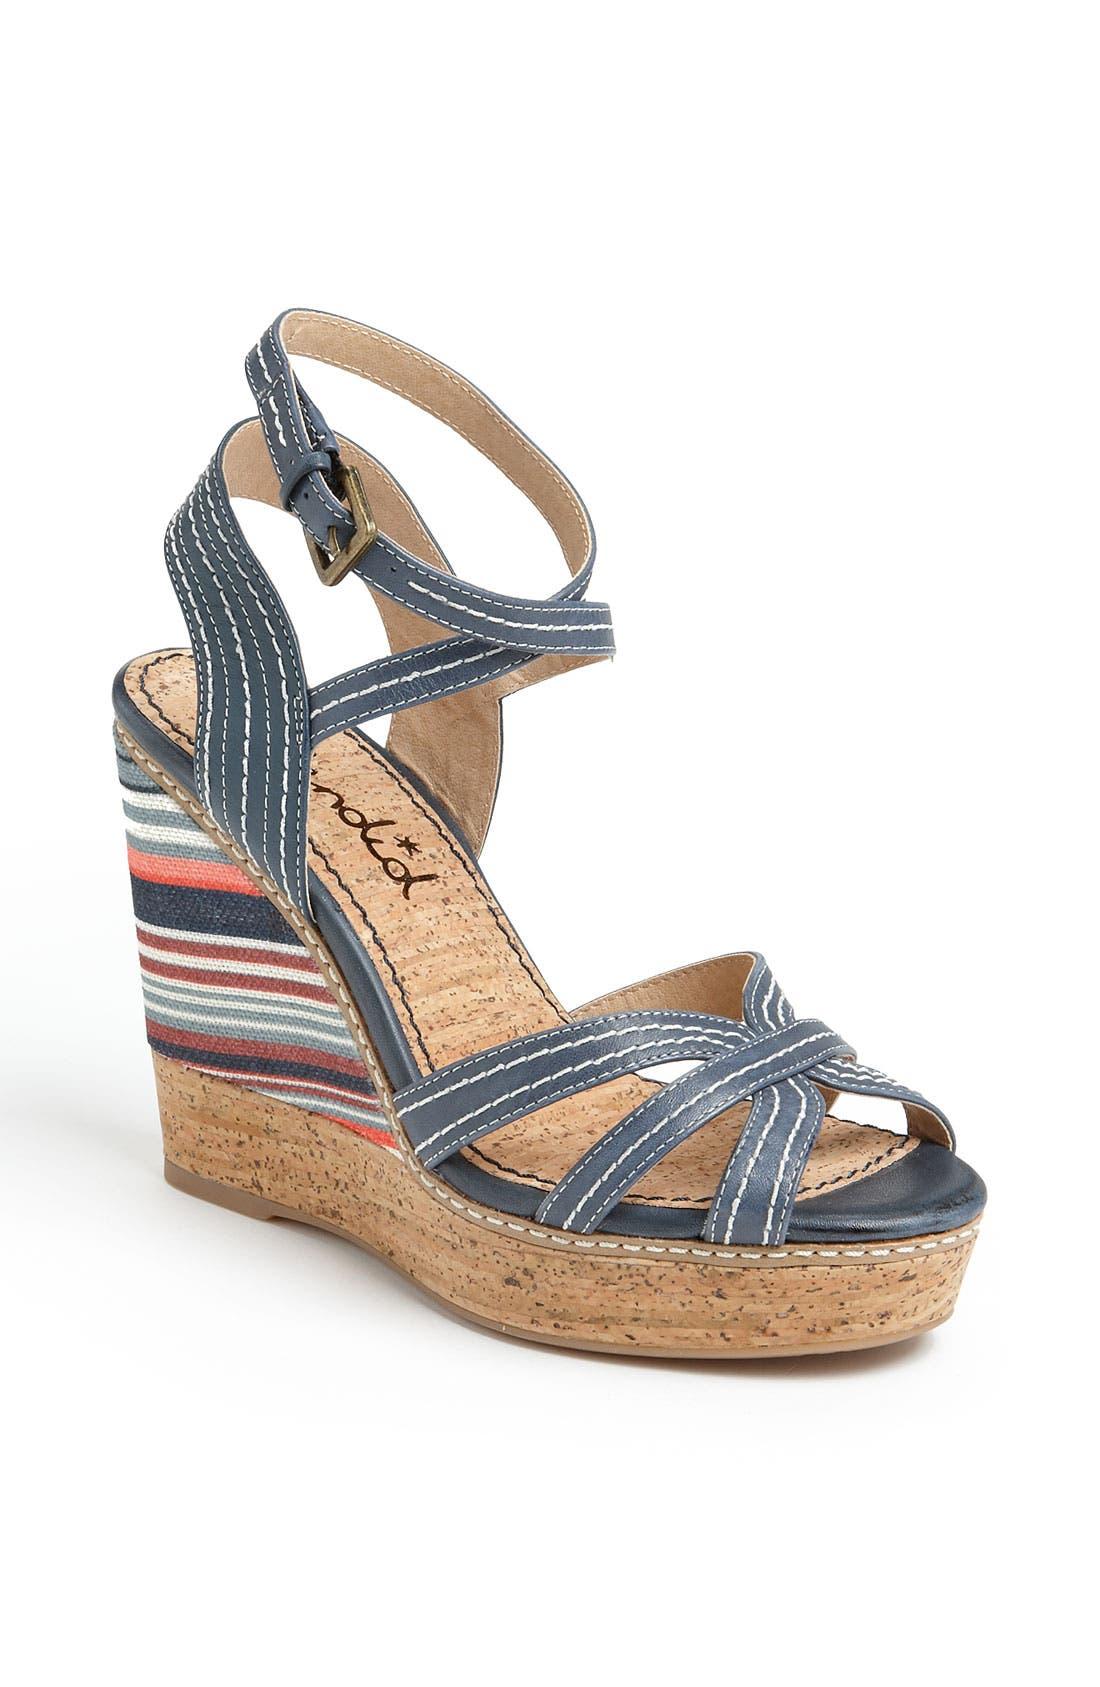 Alternate Image 1 Selected - Splendid 'Kayla' Wedge Sandal